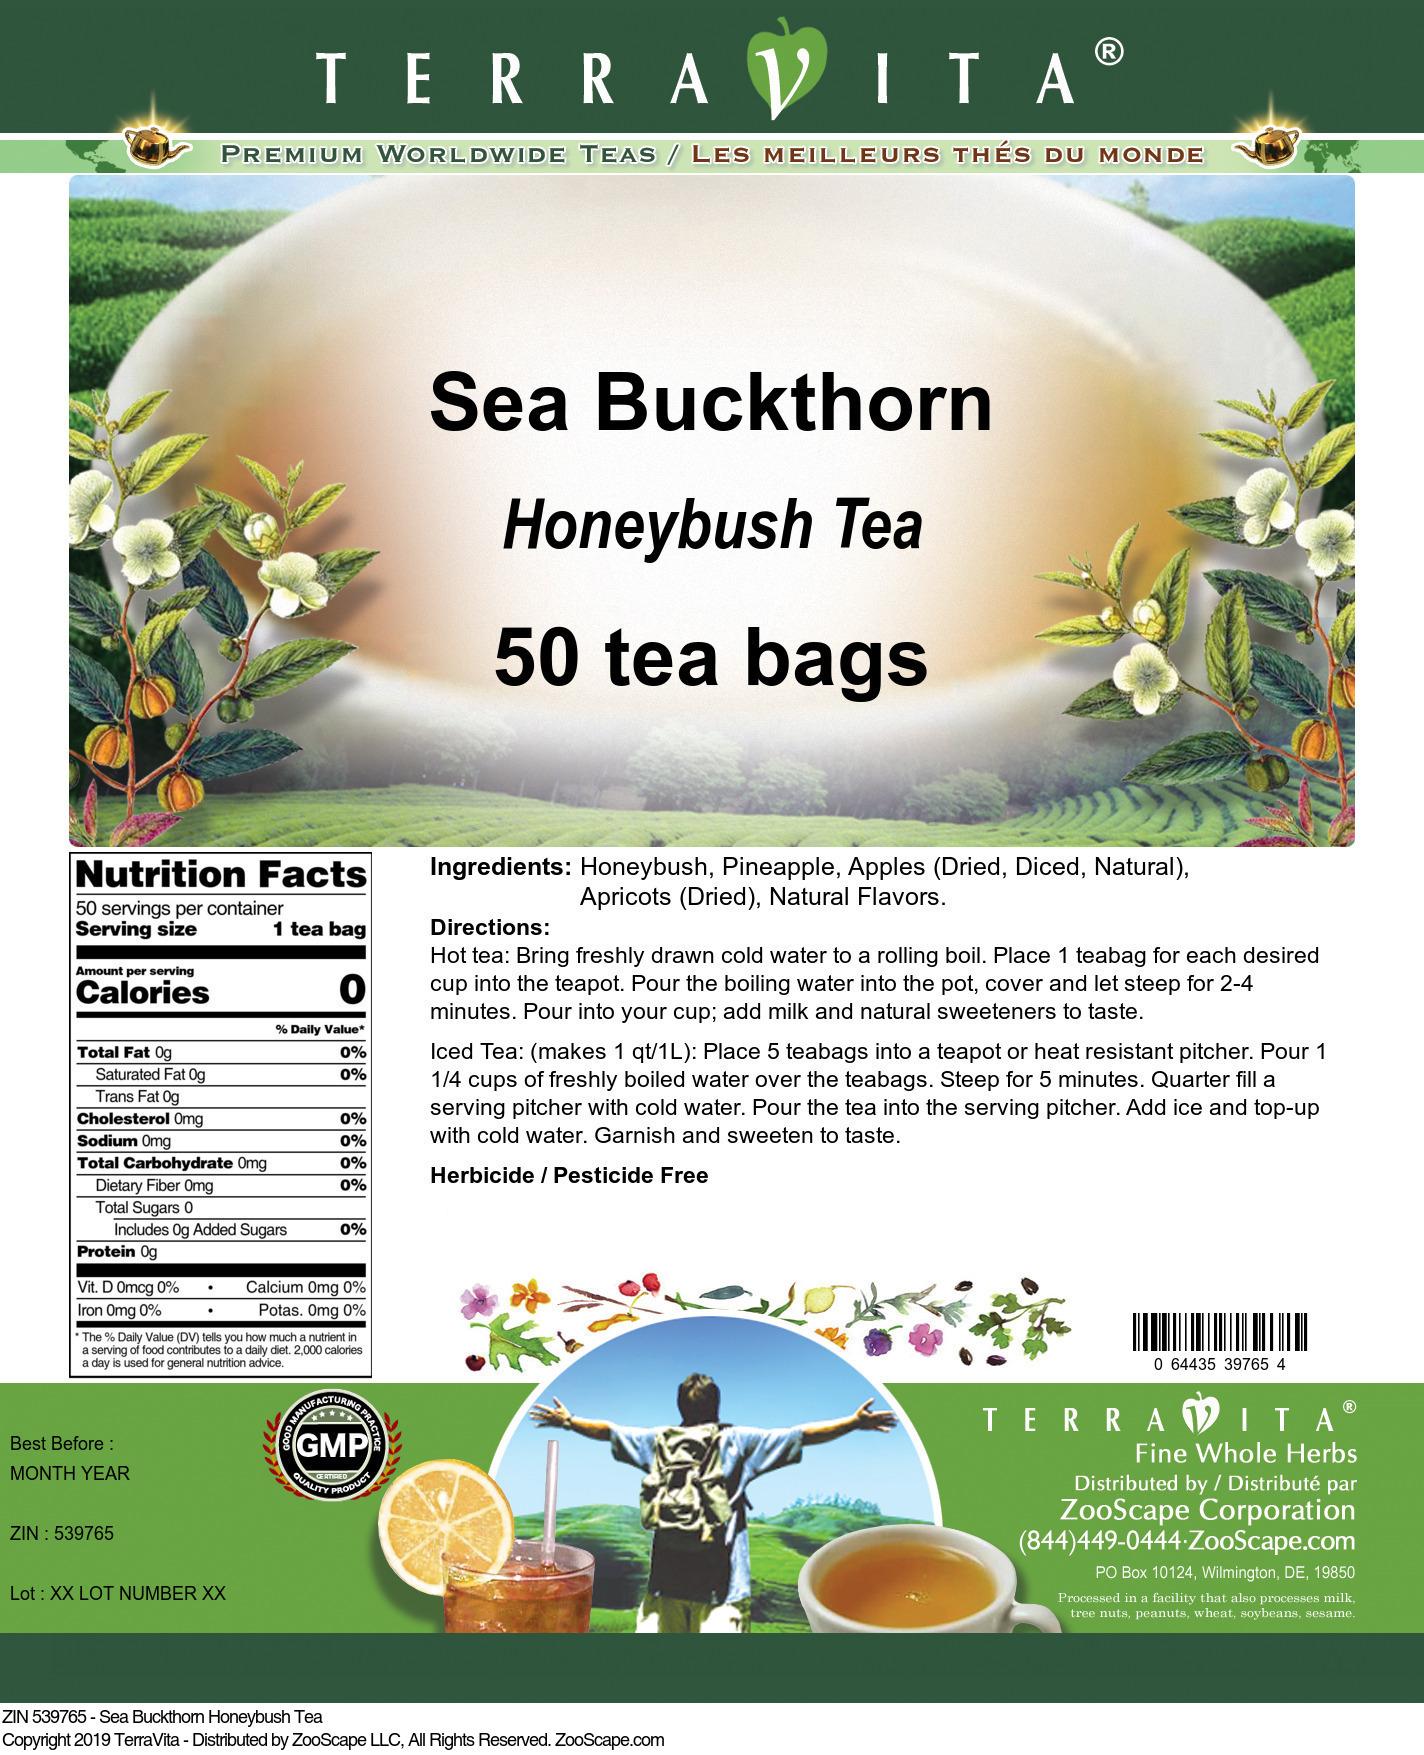 Sea Buckthorn Honeybush Tea